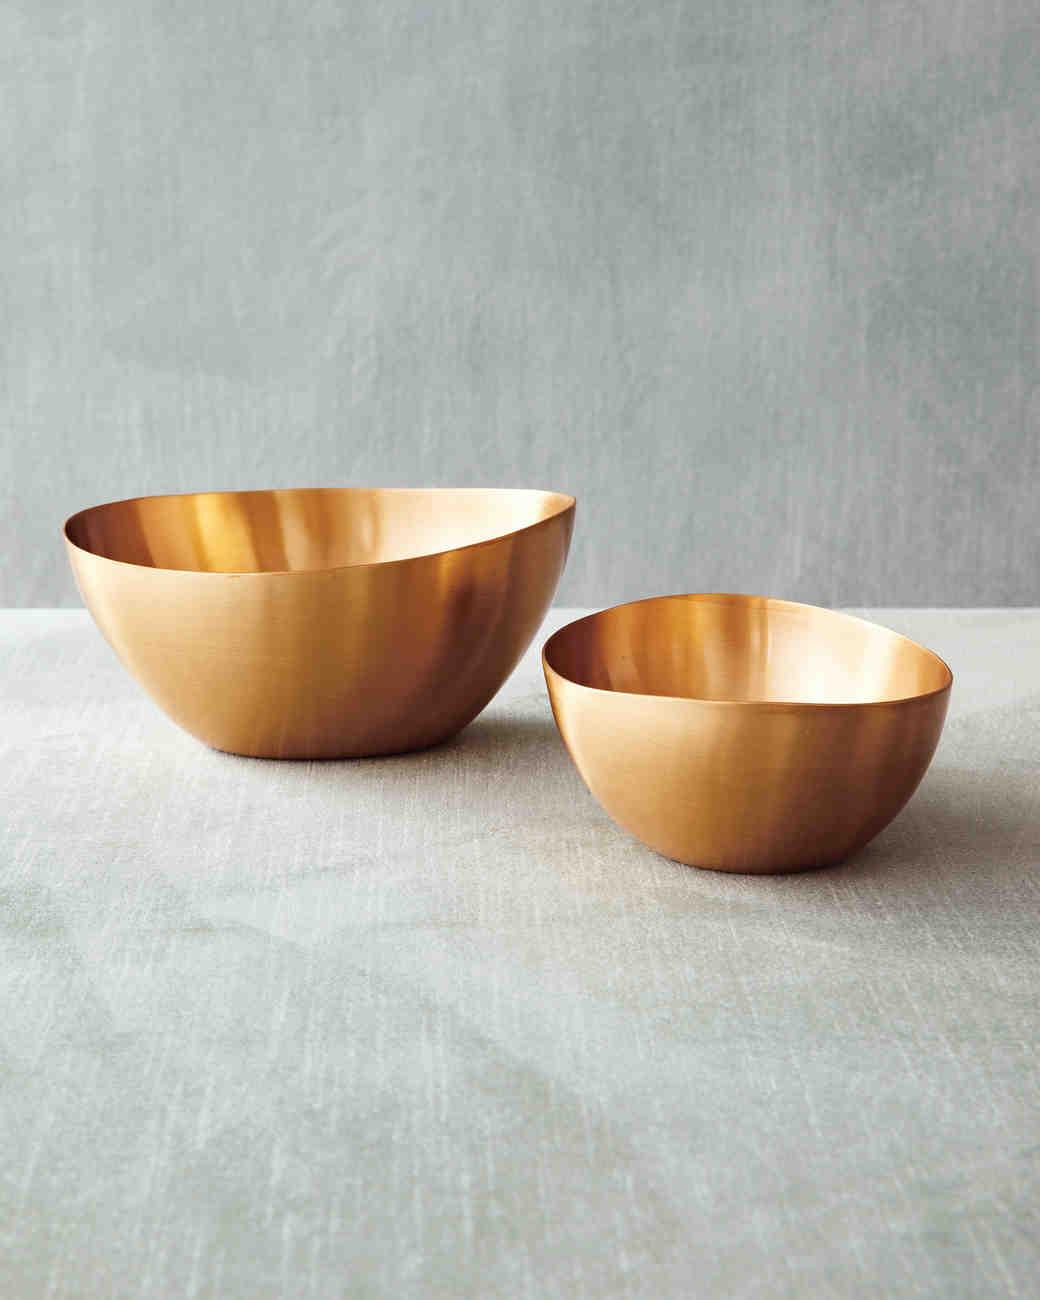 ginger-bowls-0811mwd107434.jpg